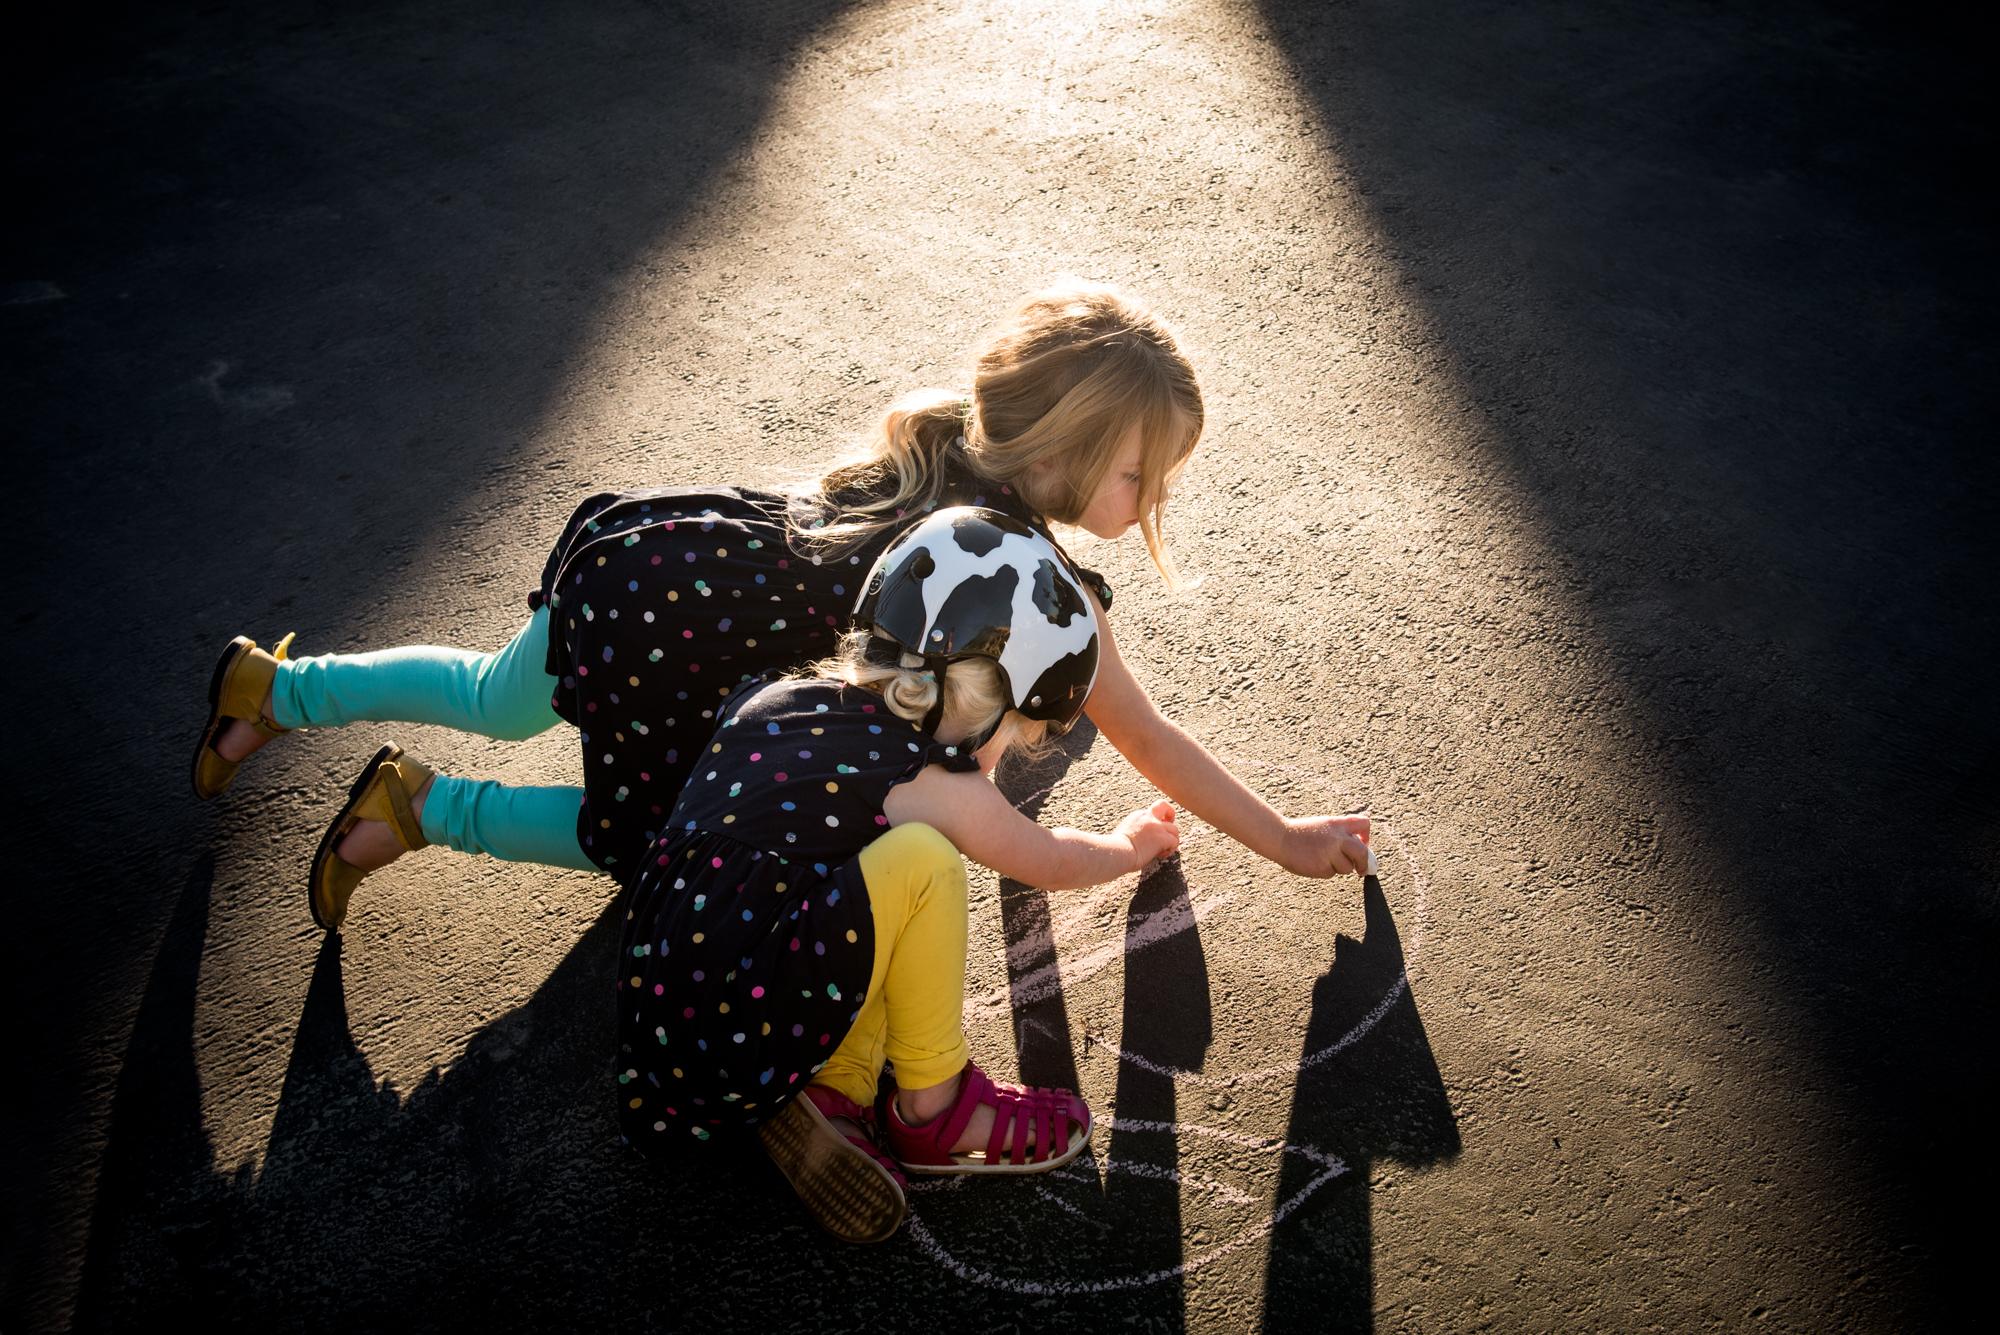 Natural-Light-Photography-Karlee-Hooper0022